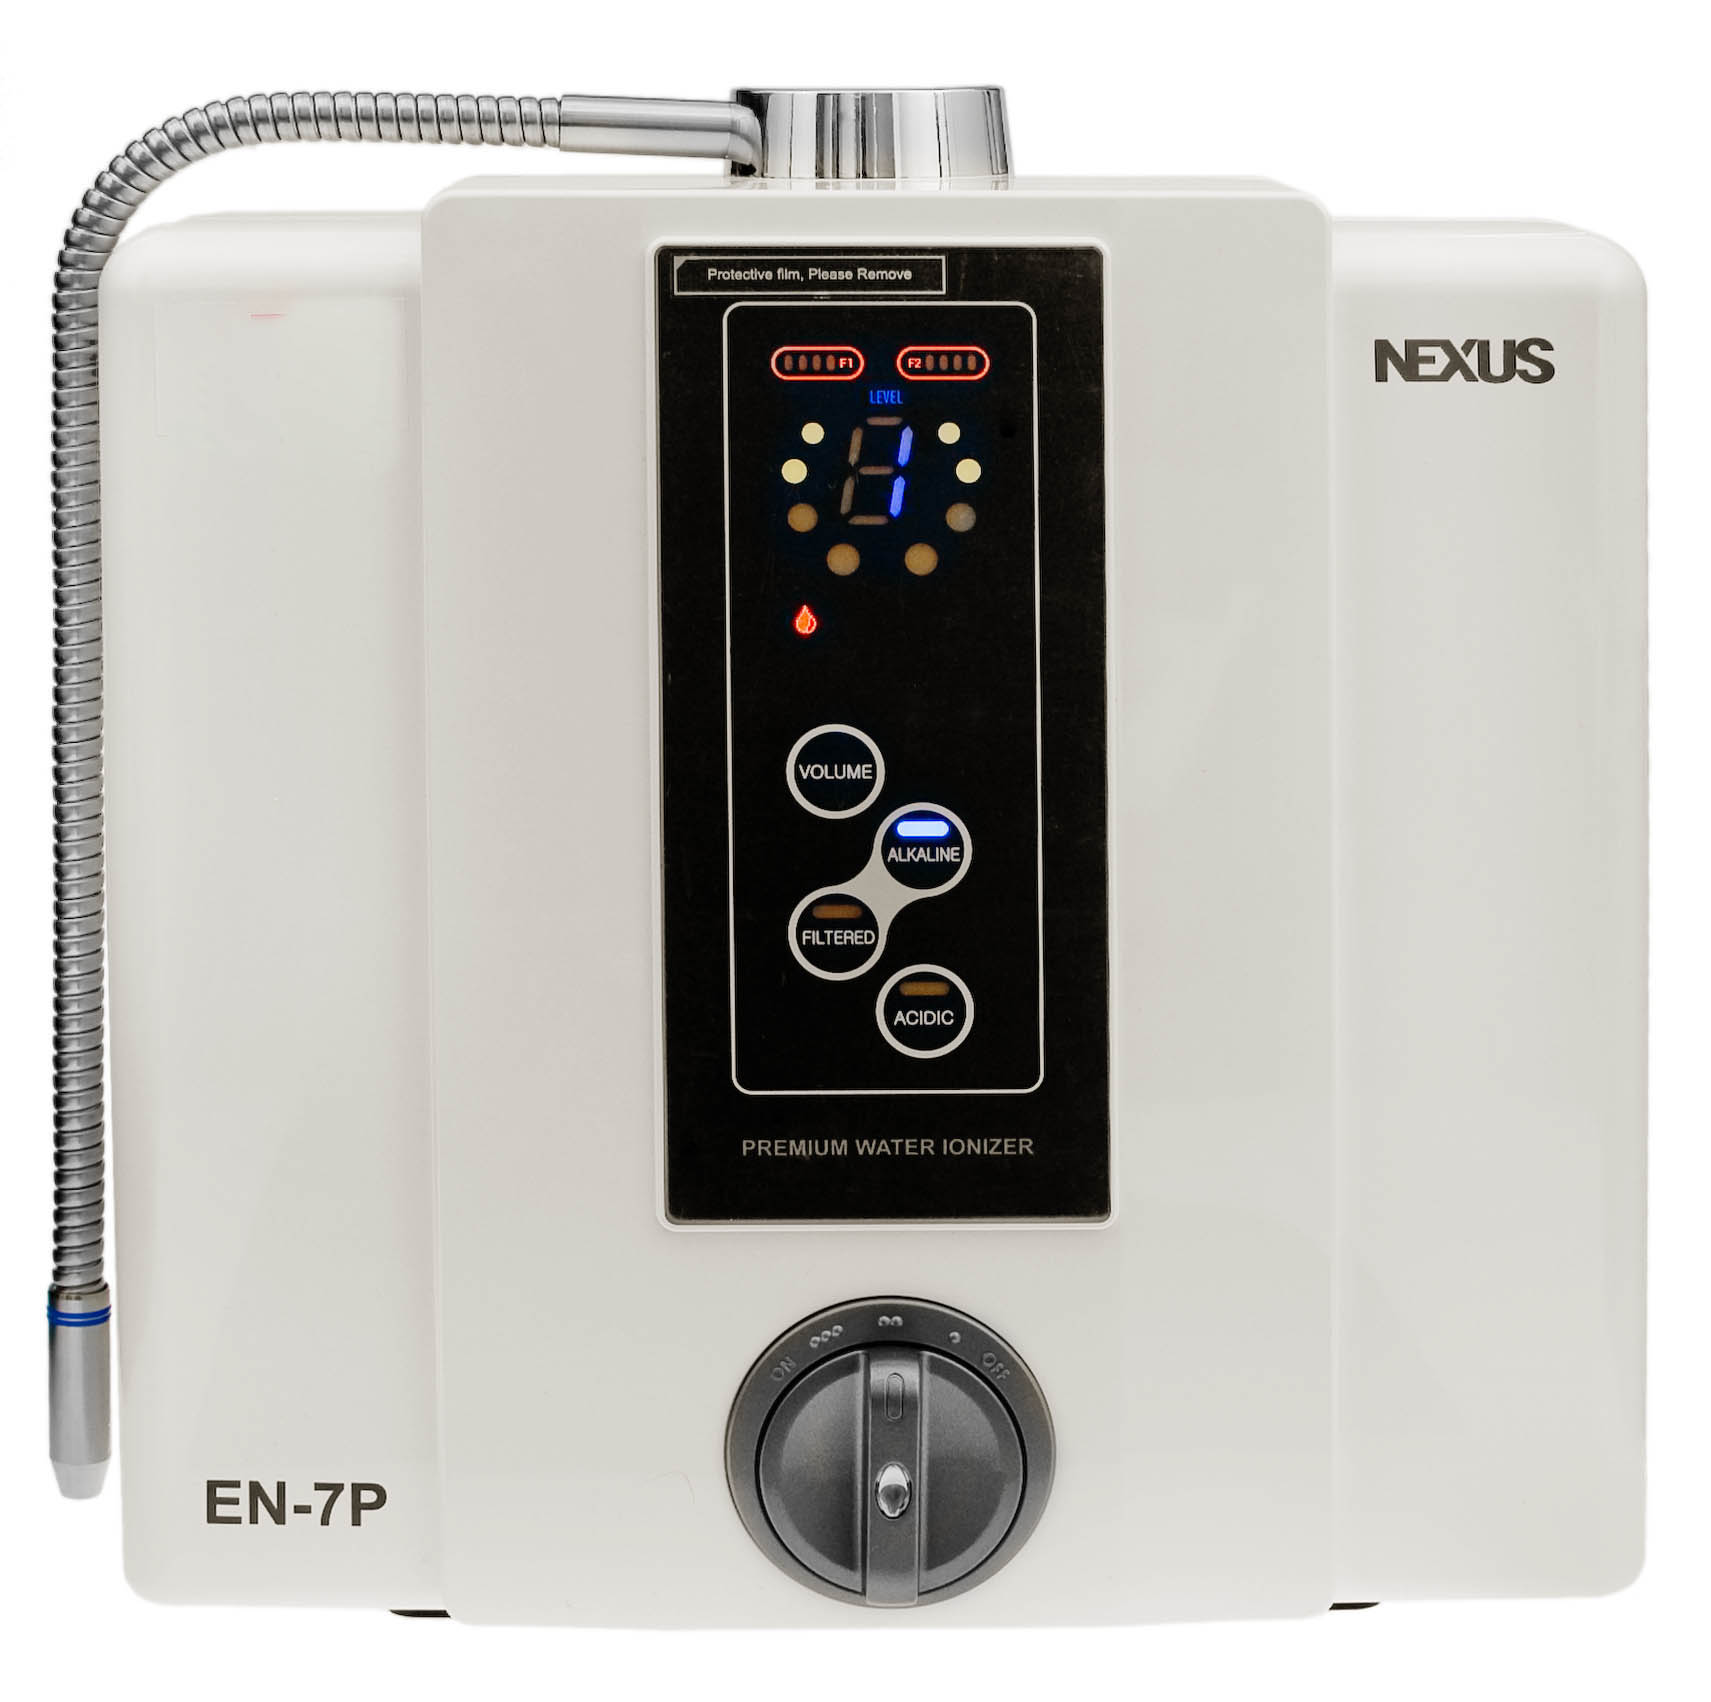 Jonizator wody z podwójnym filtrem Nexus EN-7P